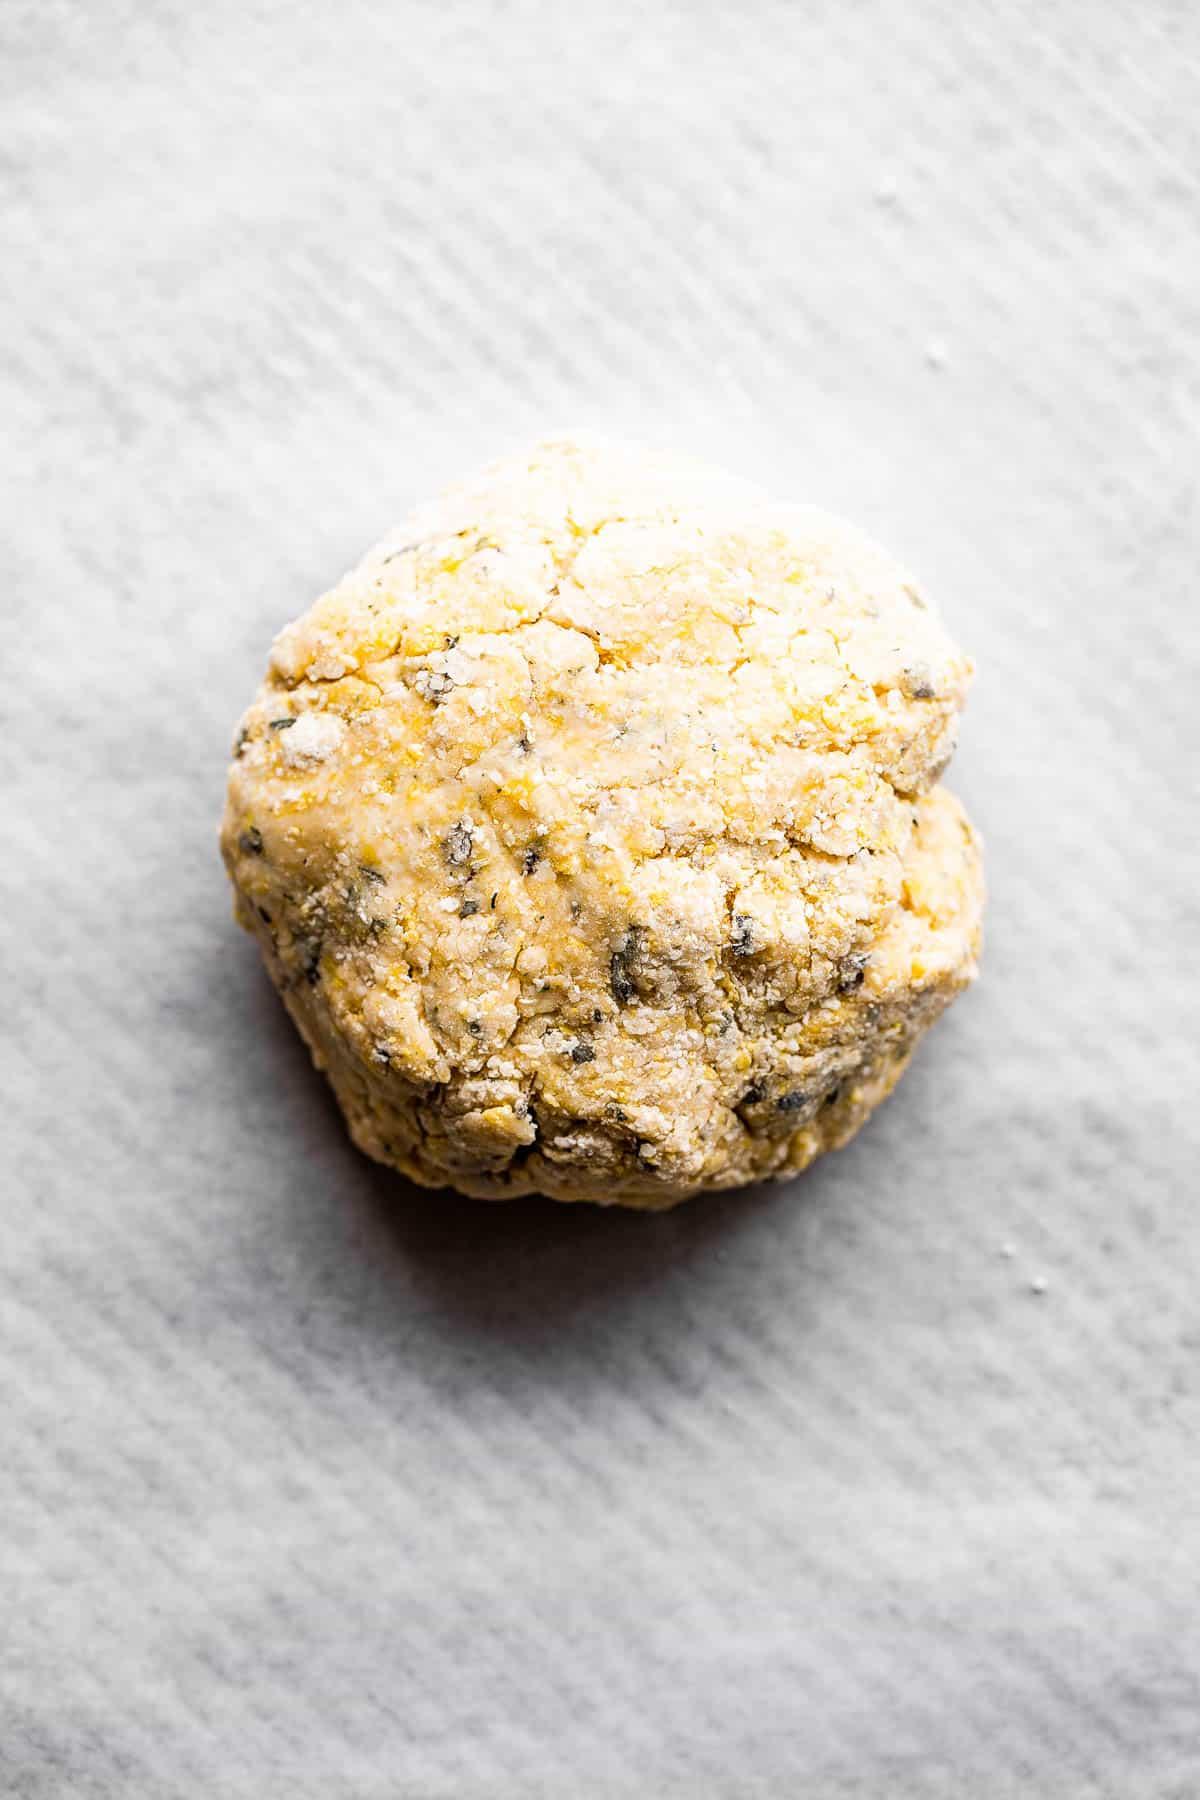 ball of dough for homemade crackers